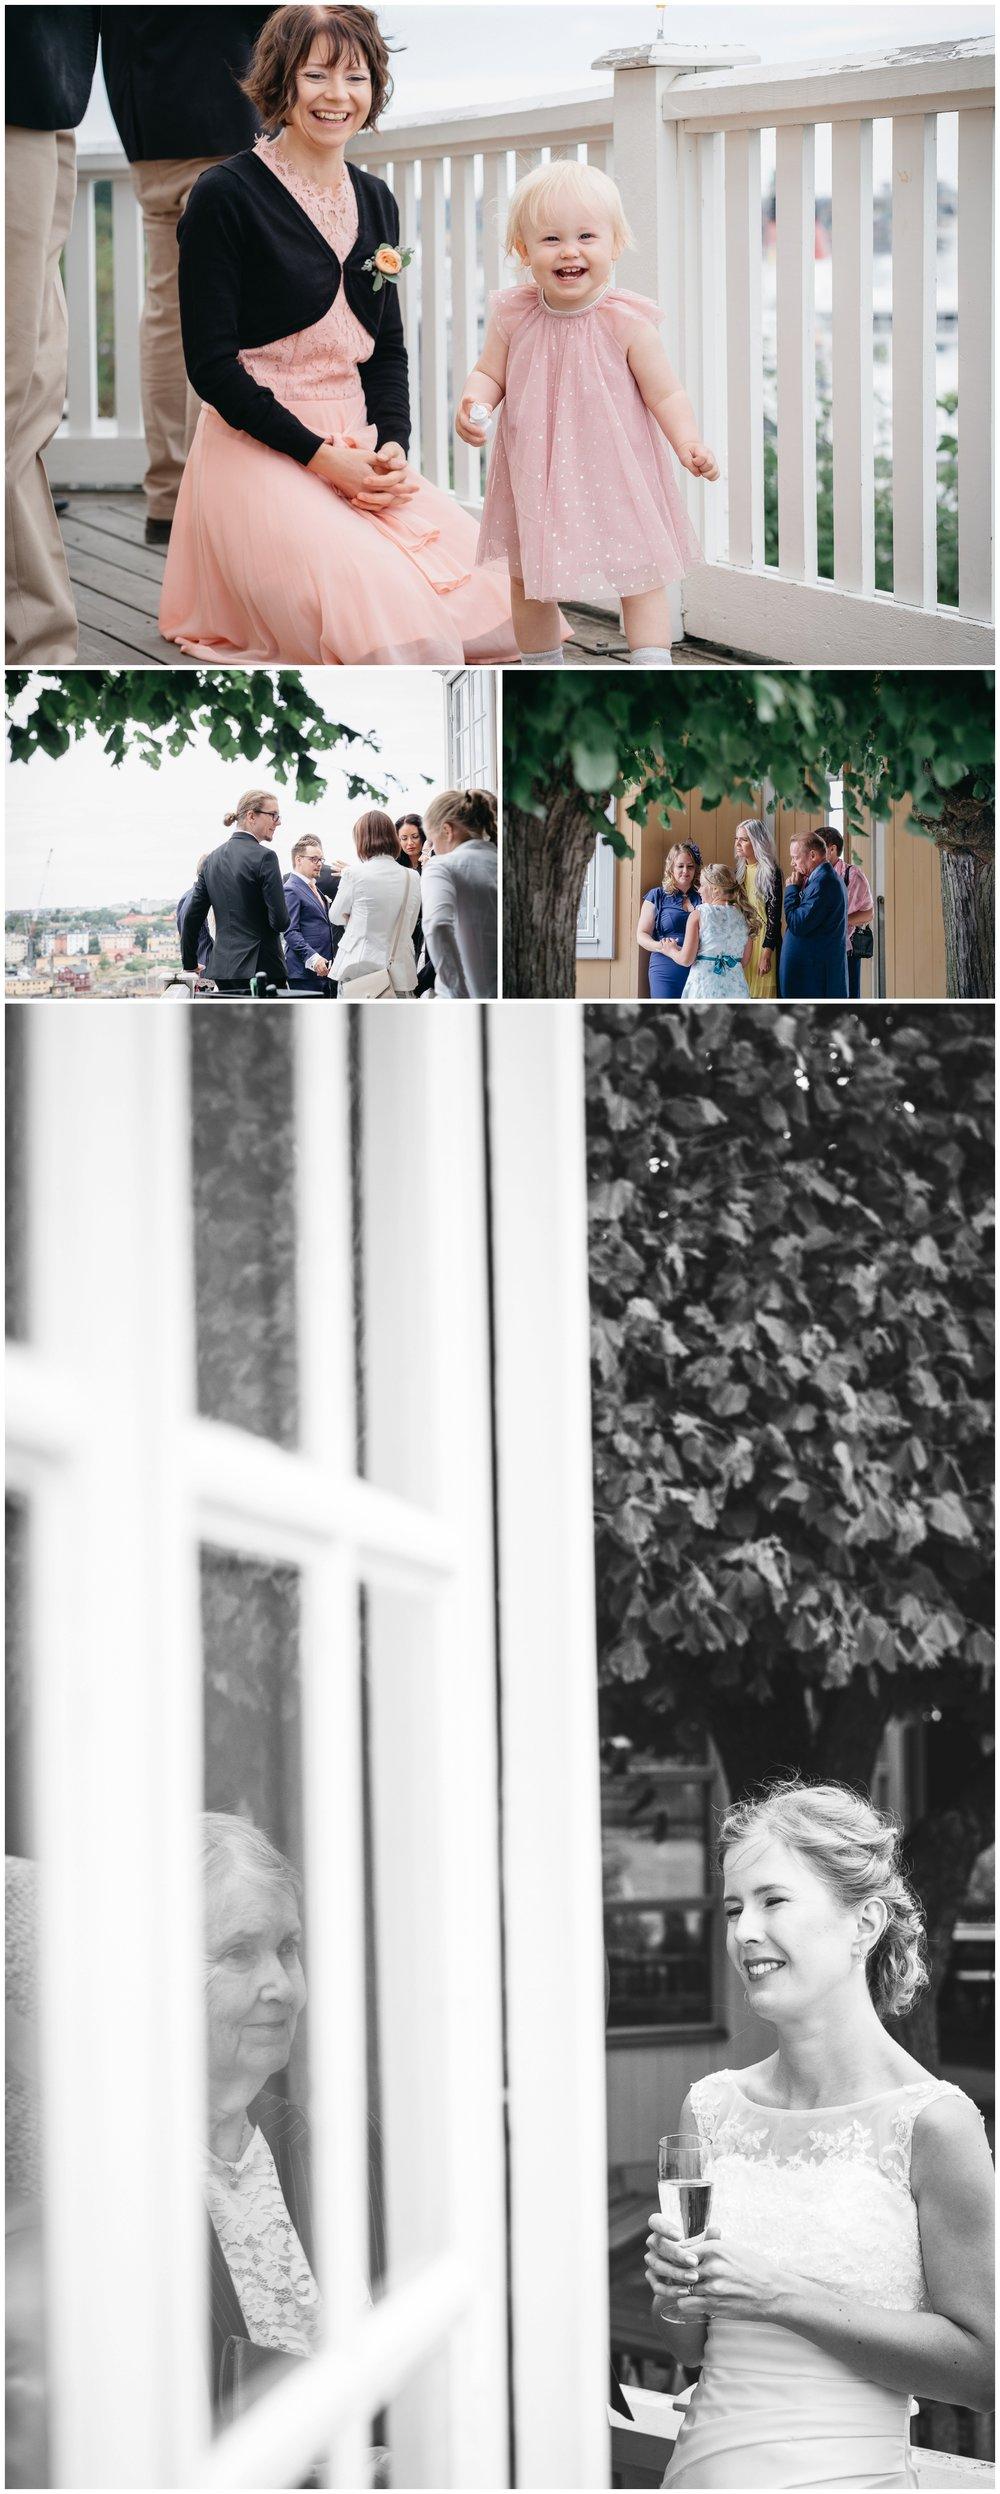 360you-photography-brollopsfotograf-fafangan-stockholm-vallentuna-taby-j-j18.jpg